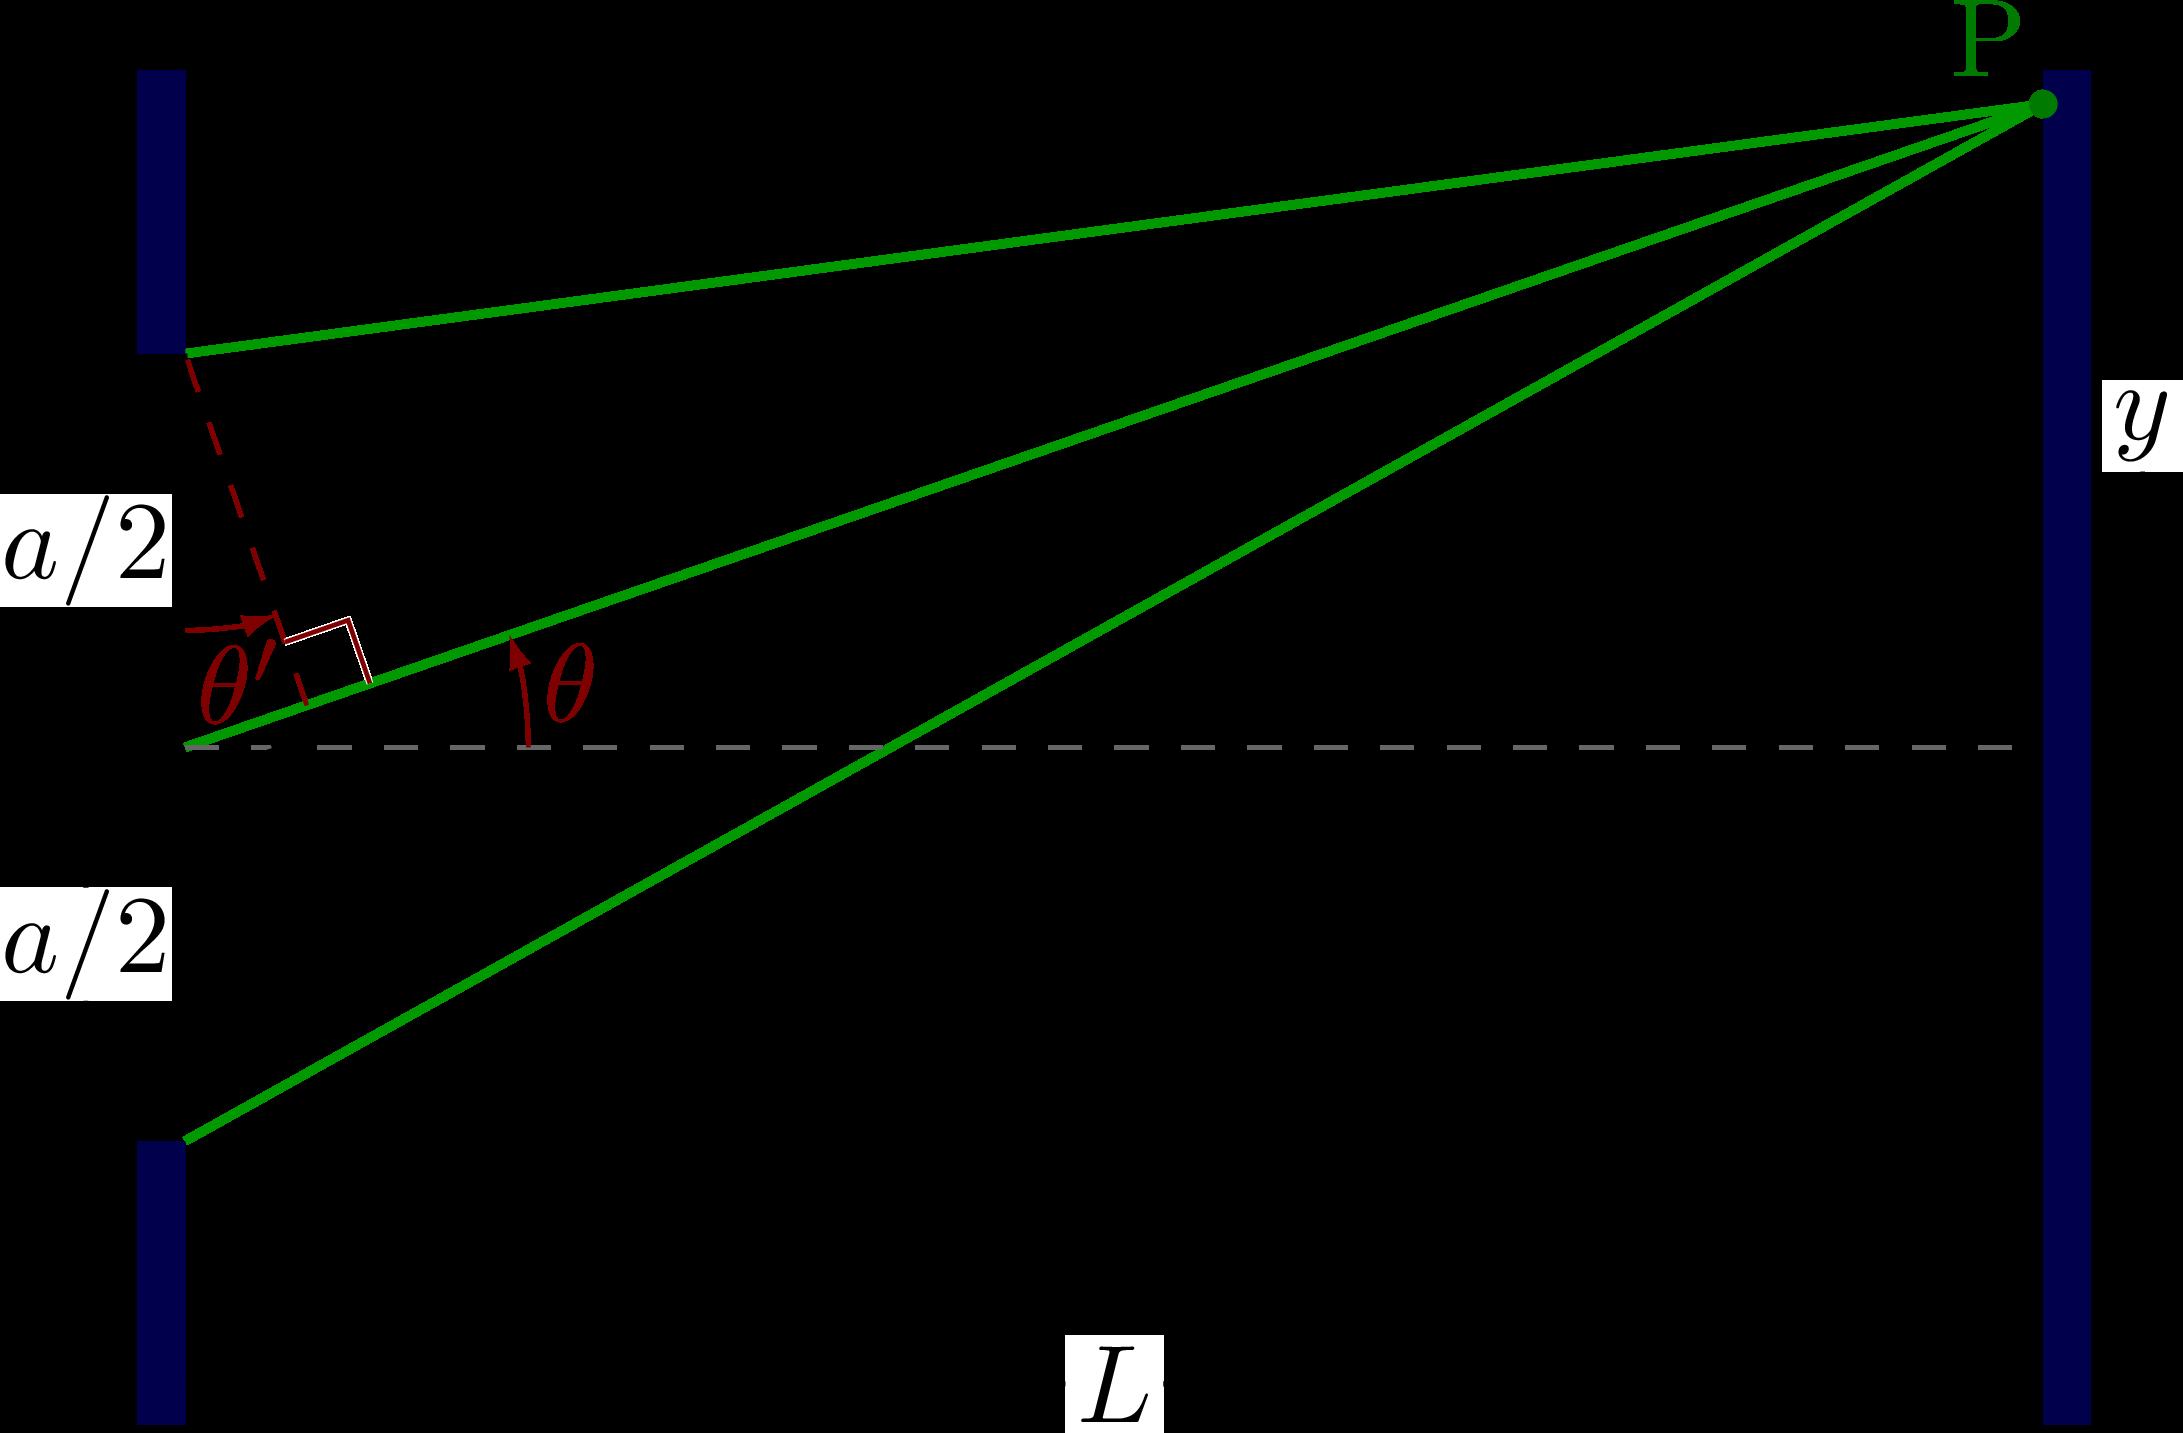 optics_diffraction-007.png